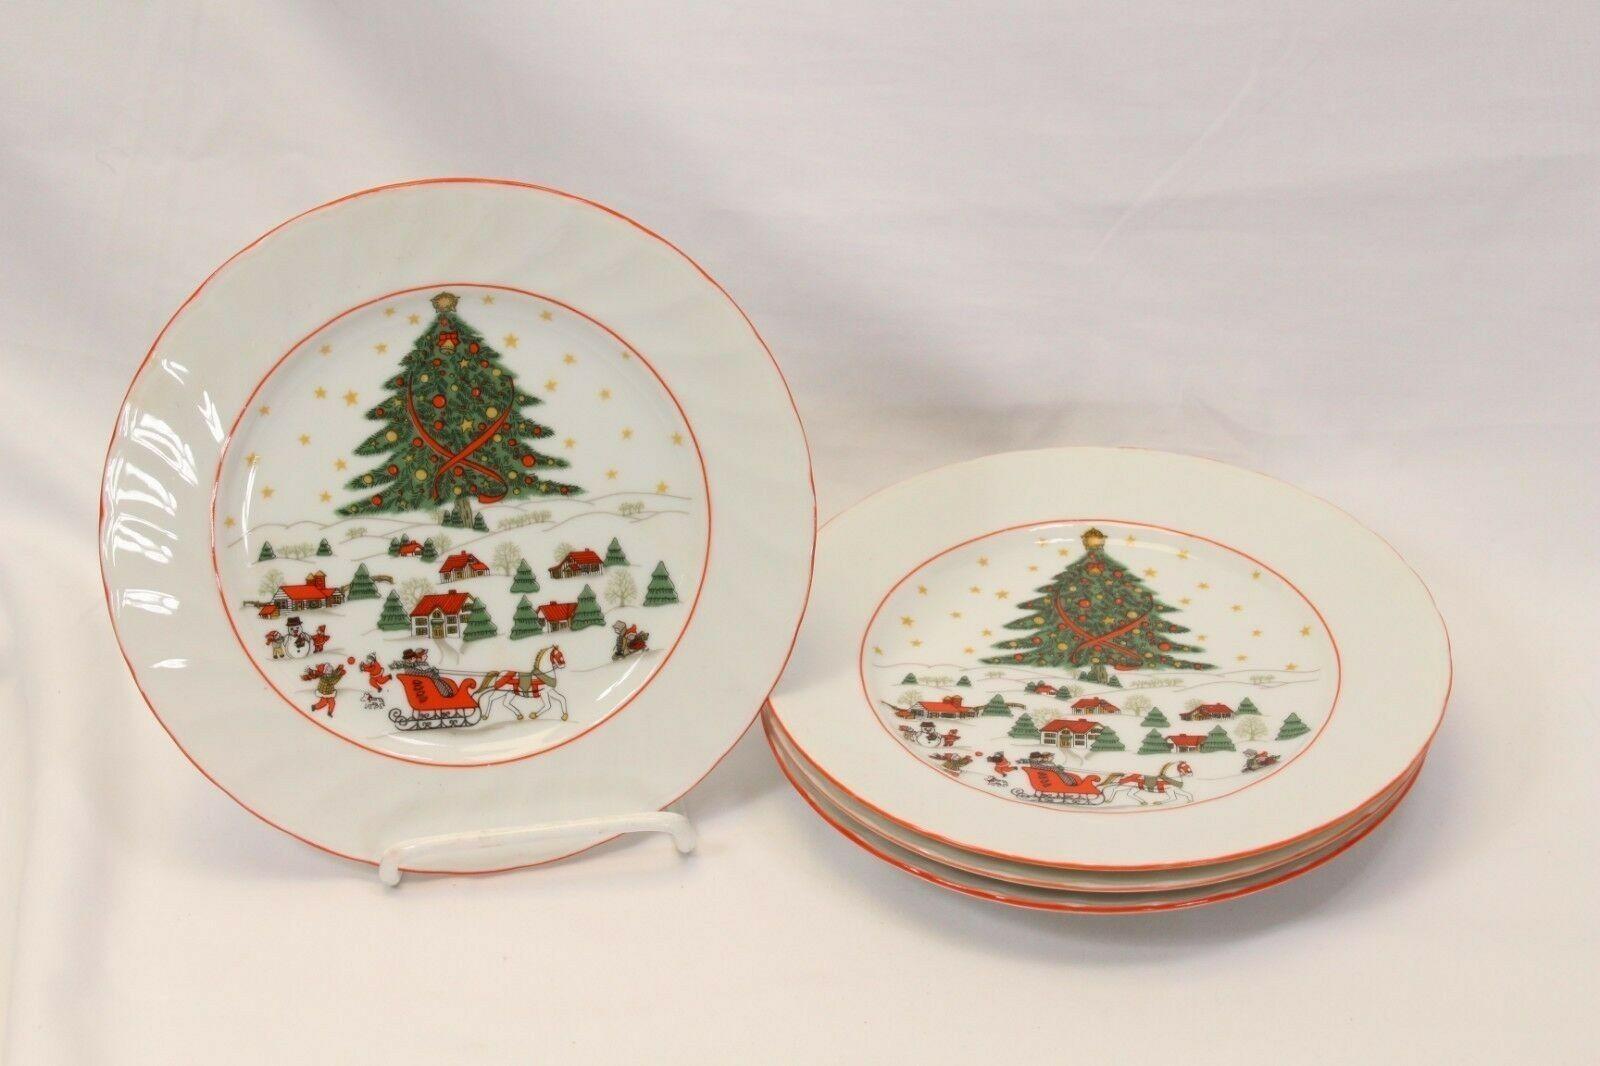 Kopin Xmas Pleasure Dinner Plates Scalloped Rim Lot of 16 image 2